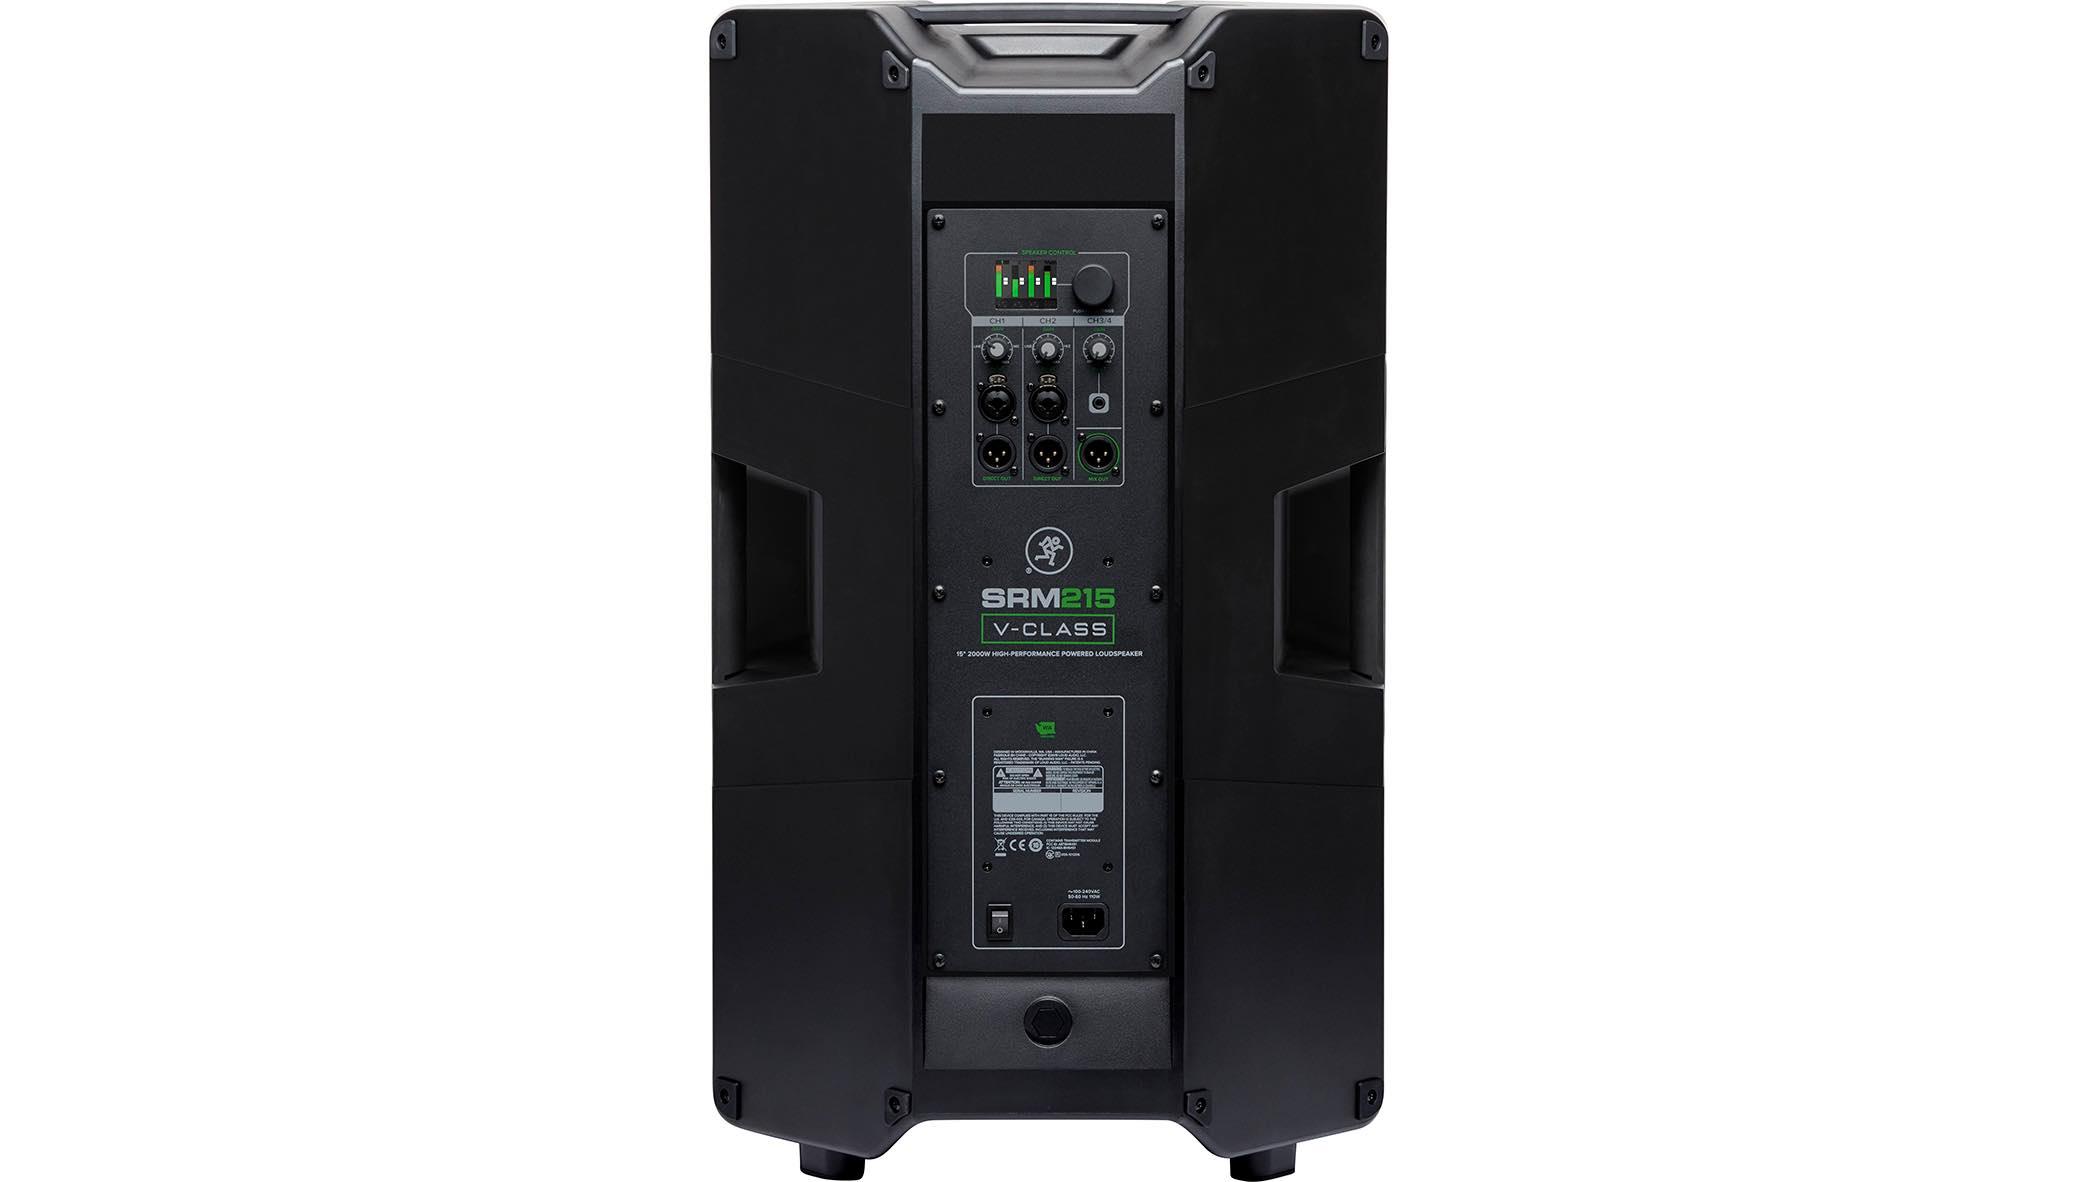 Mackie SRM210 V-Class monitor live speaker dsp pro audiofader